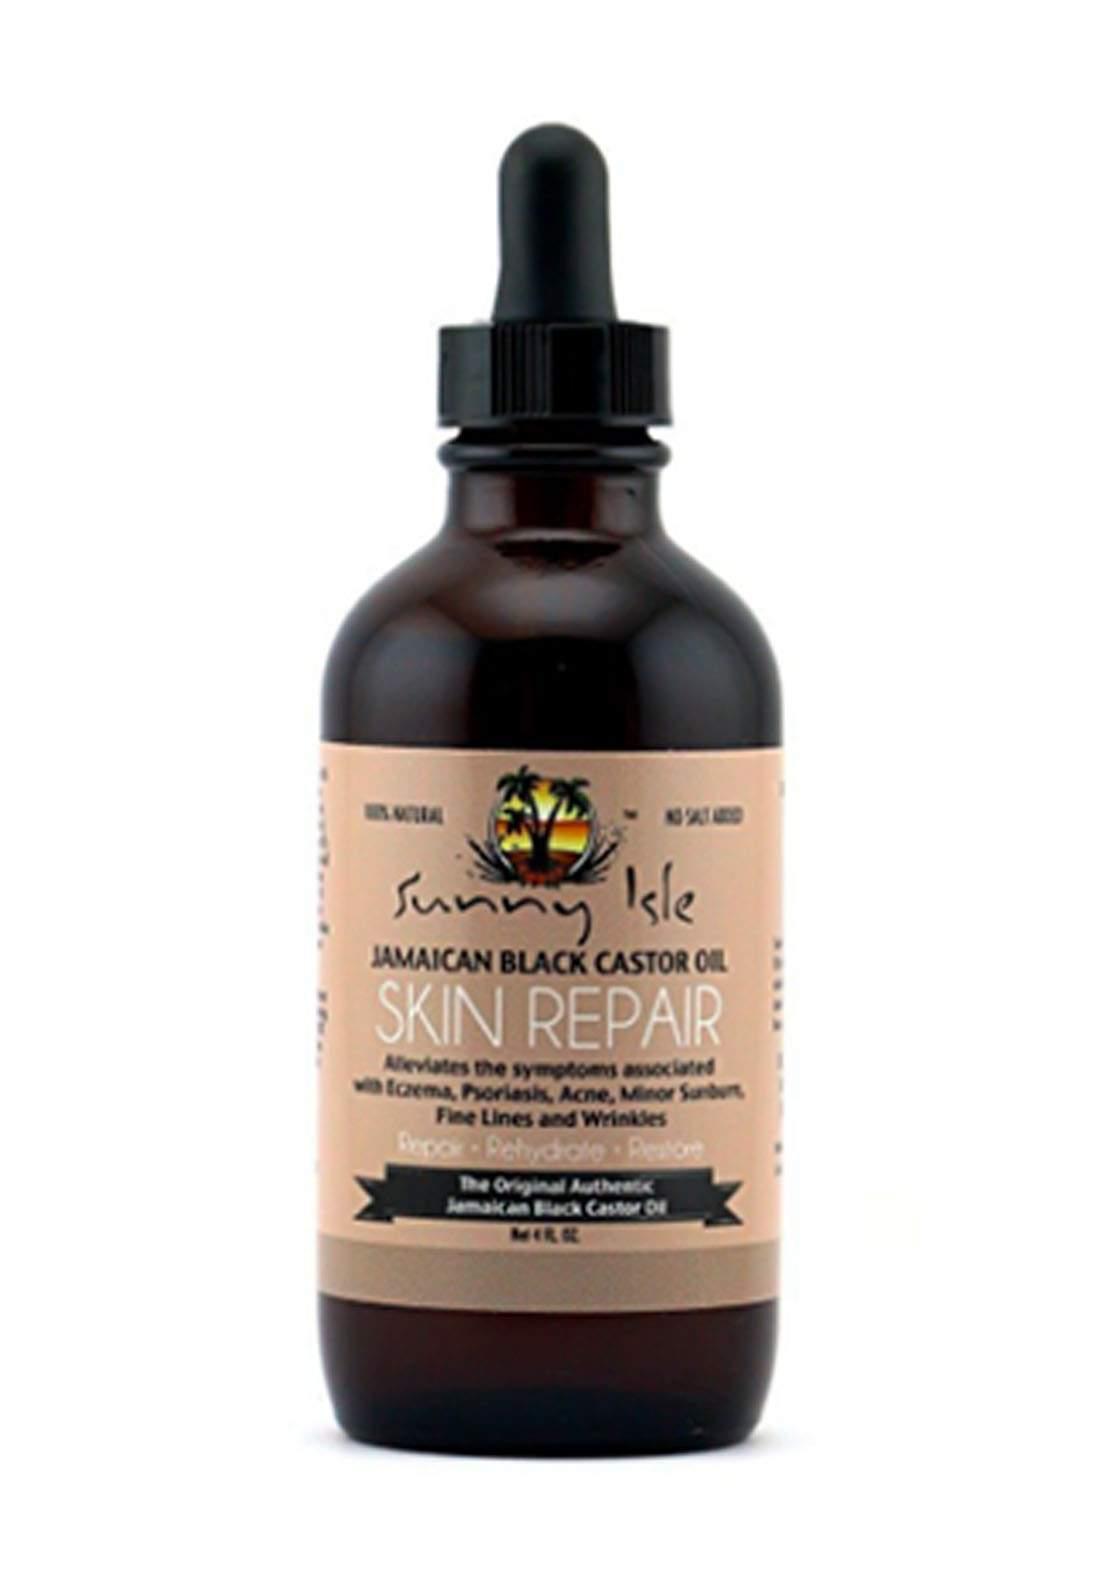 Sunny Isle Jamaican Black Castor Oil Skin Repair - 120ml سيرم البشرة